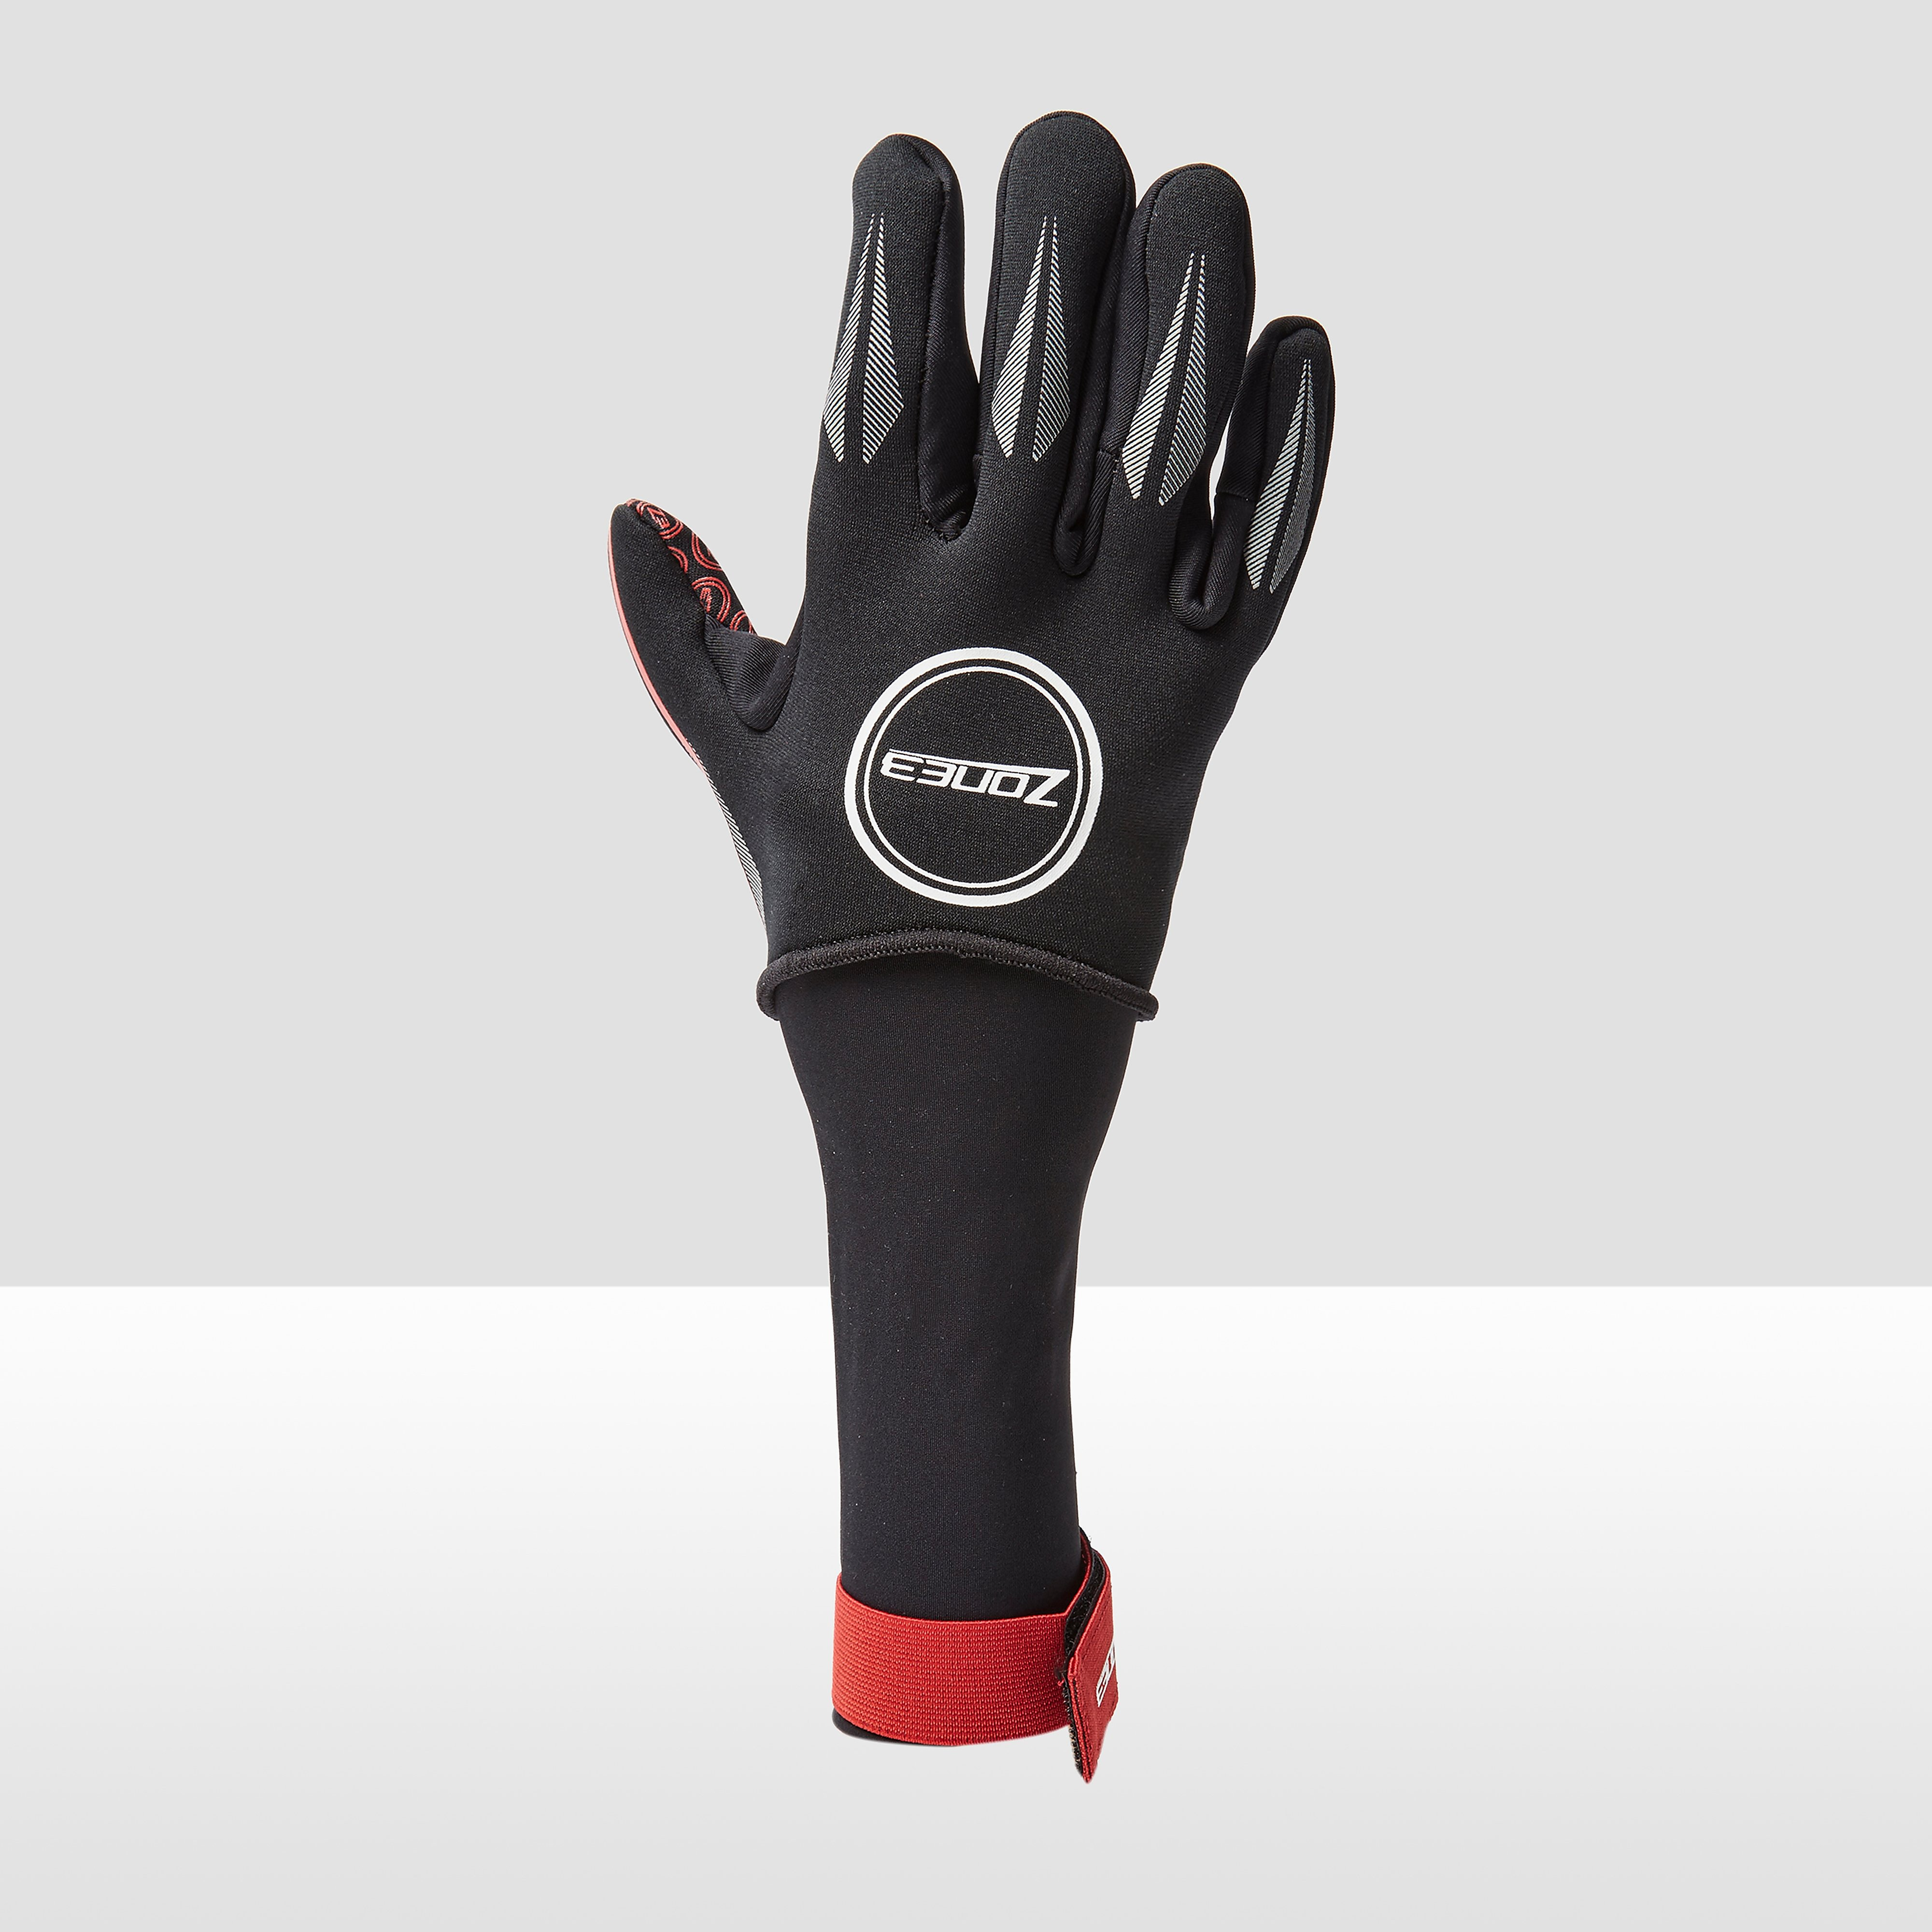 Zone 3 Neoprene Swimming Gloves